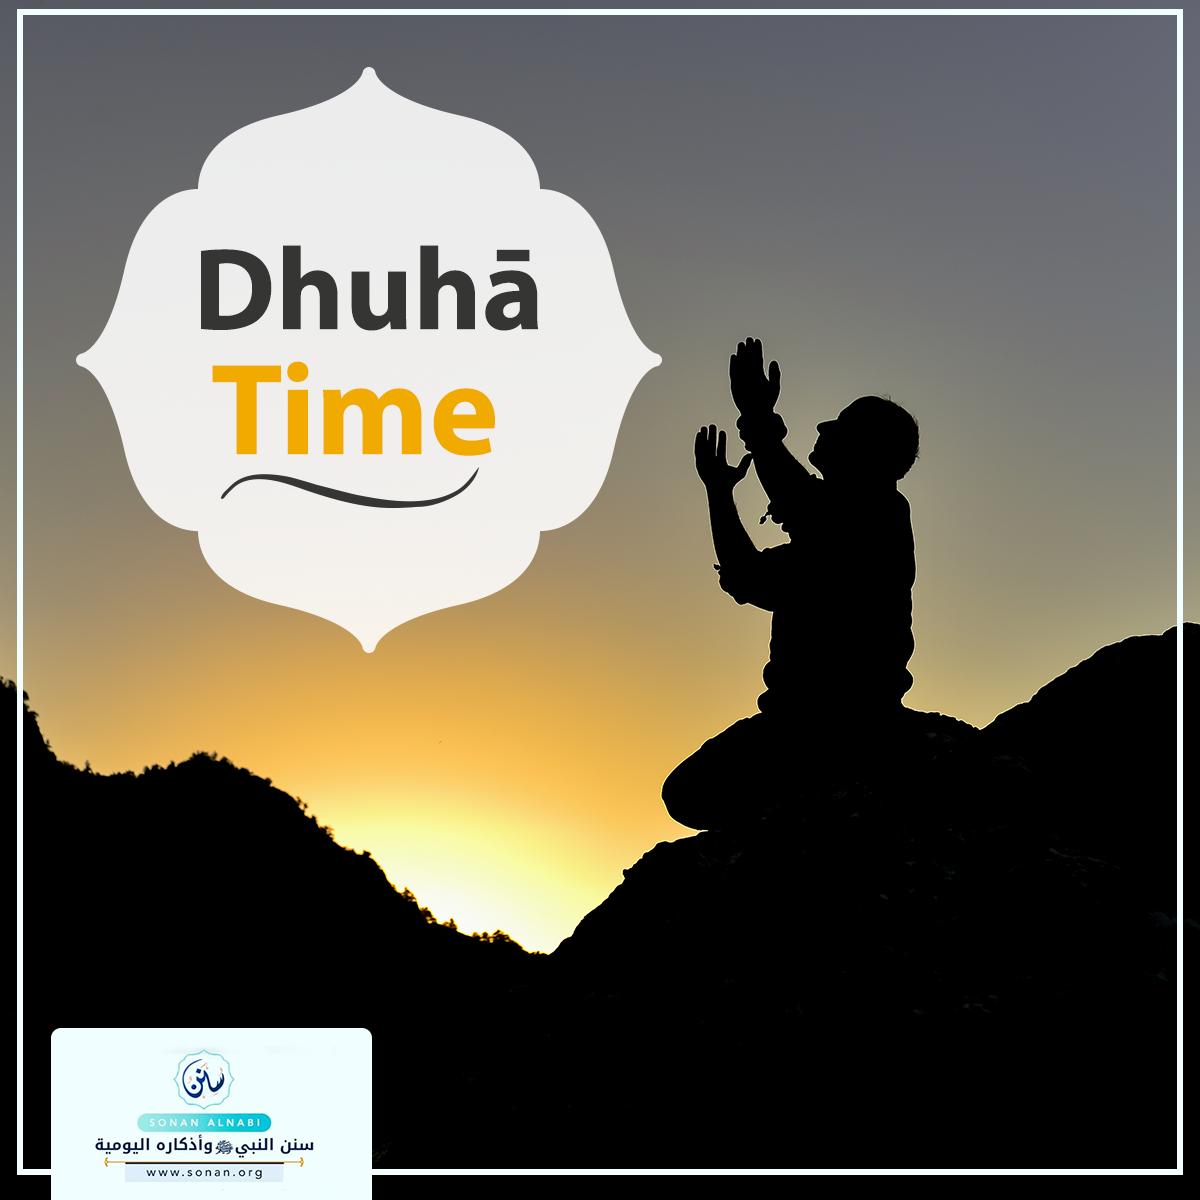 Dhuhā Time